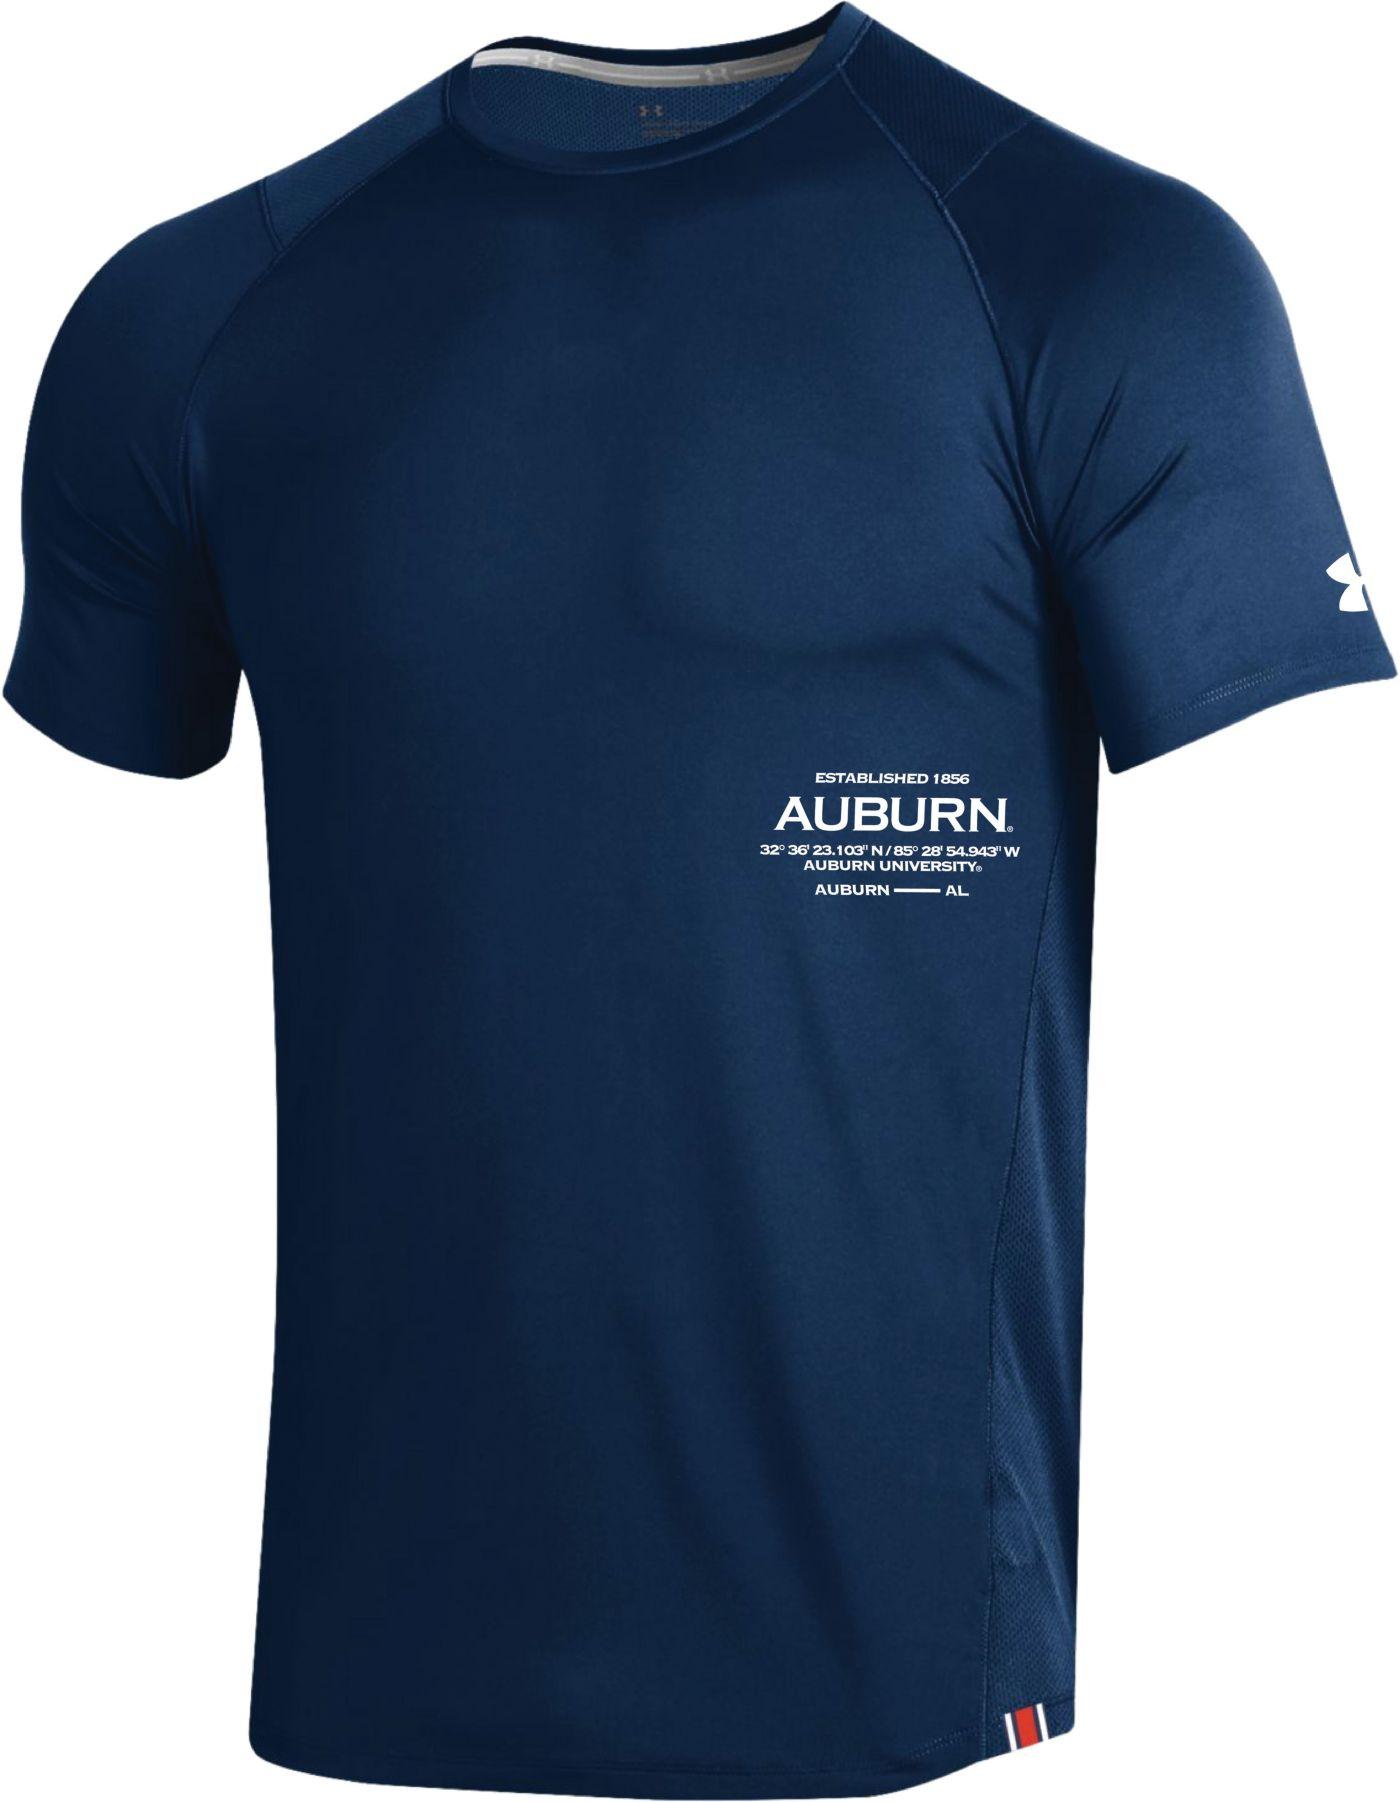 Under Armour Men's Auburn Tigers Blue Coordinates MK1 Sideline T-Shirt